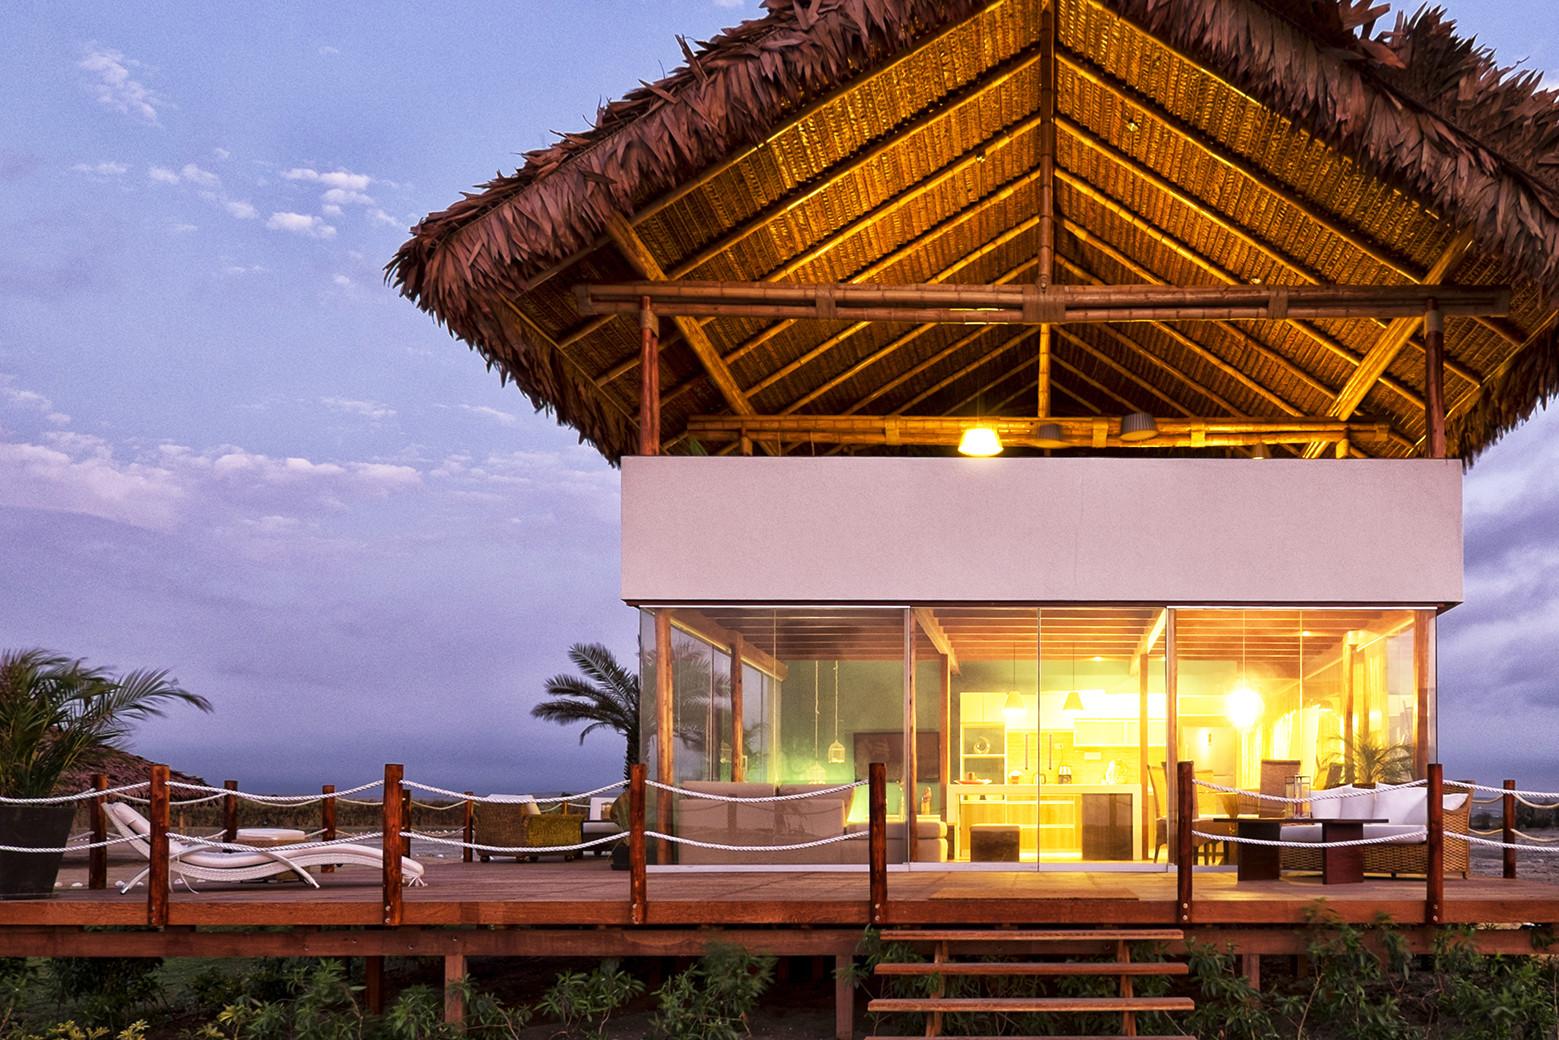 House in Playa del Carmen / YUPANA Arquitectos, Courtesy of Condominios F&F